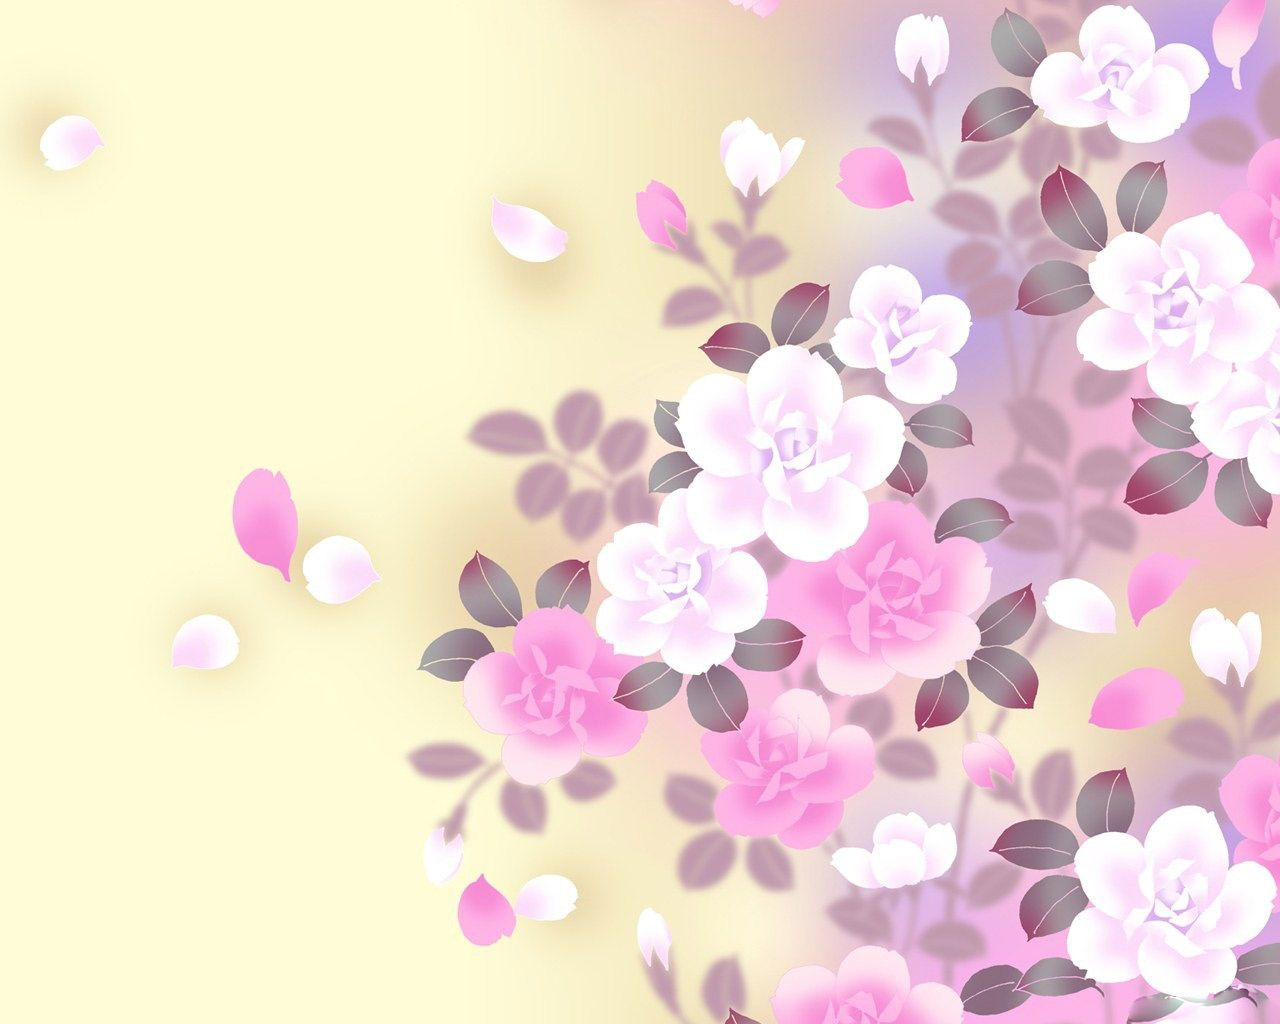 X theme background image - Flower Desktop Themes 1280 X 1024